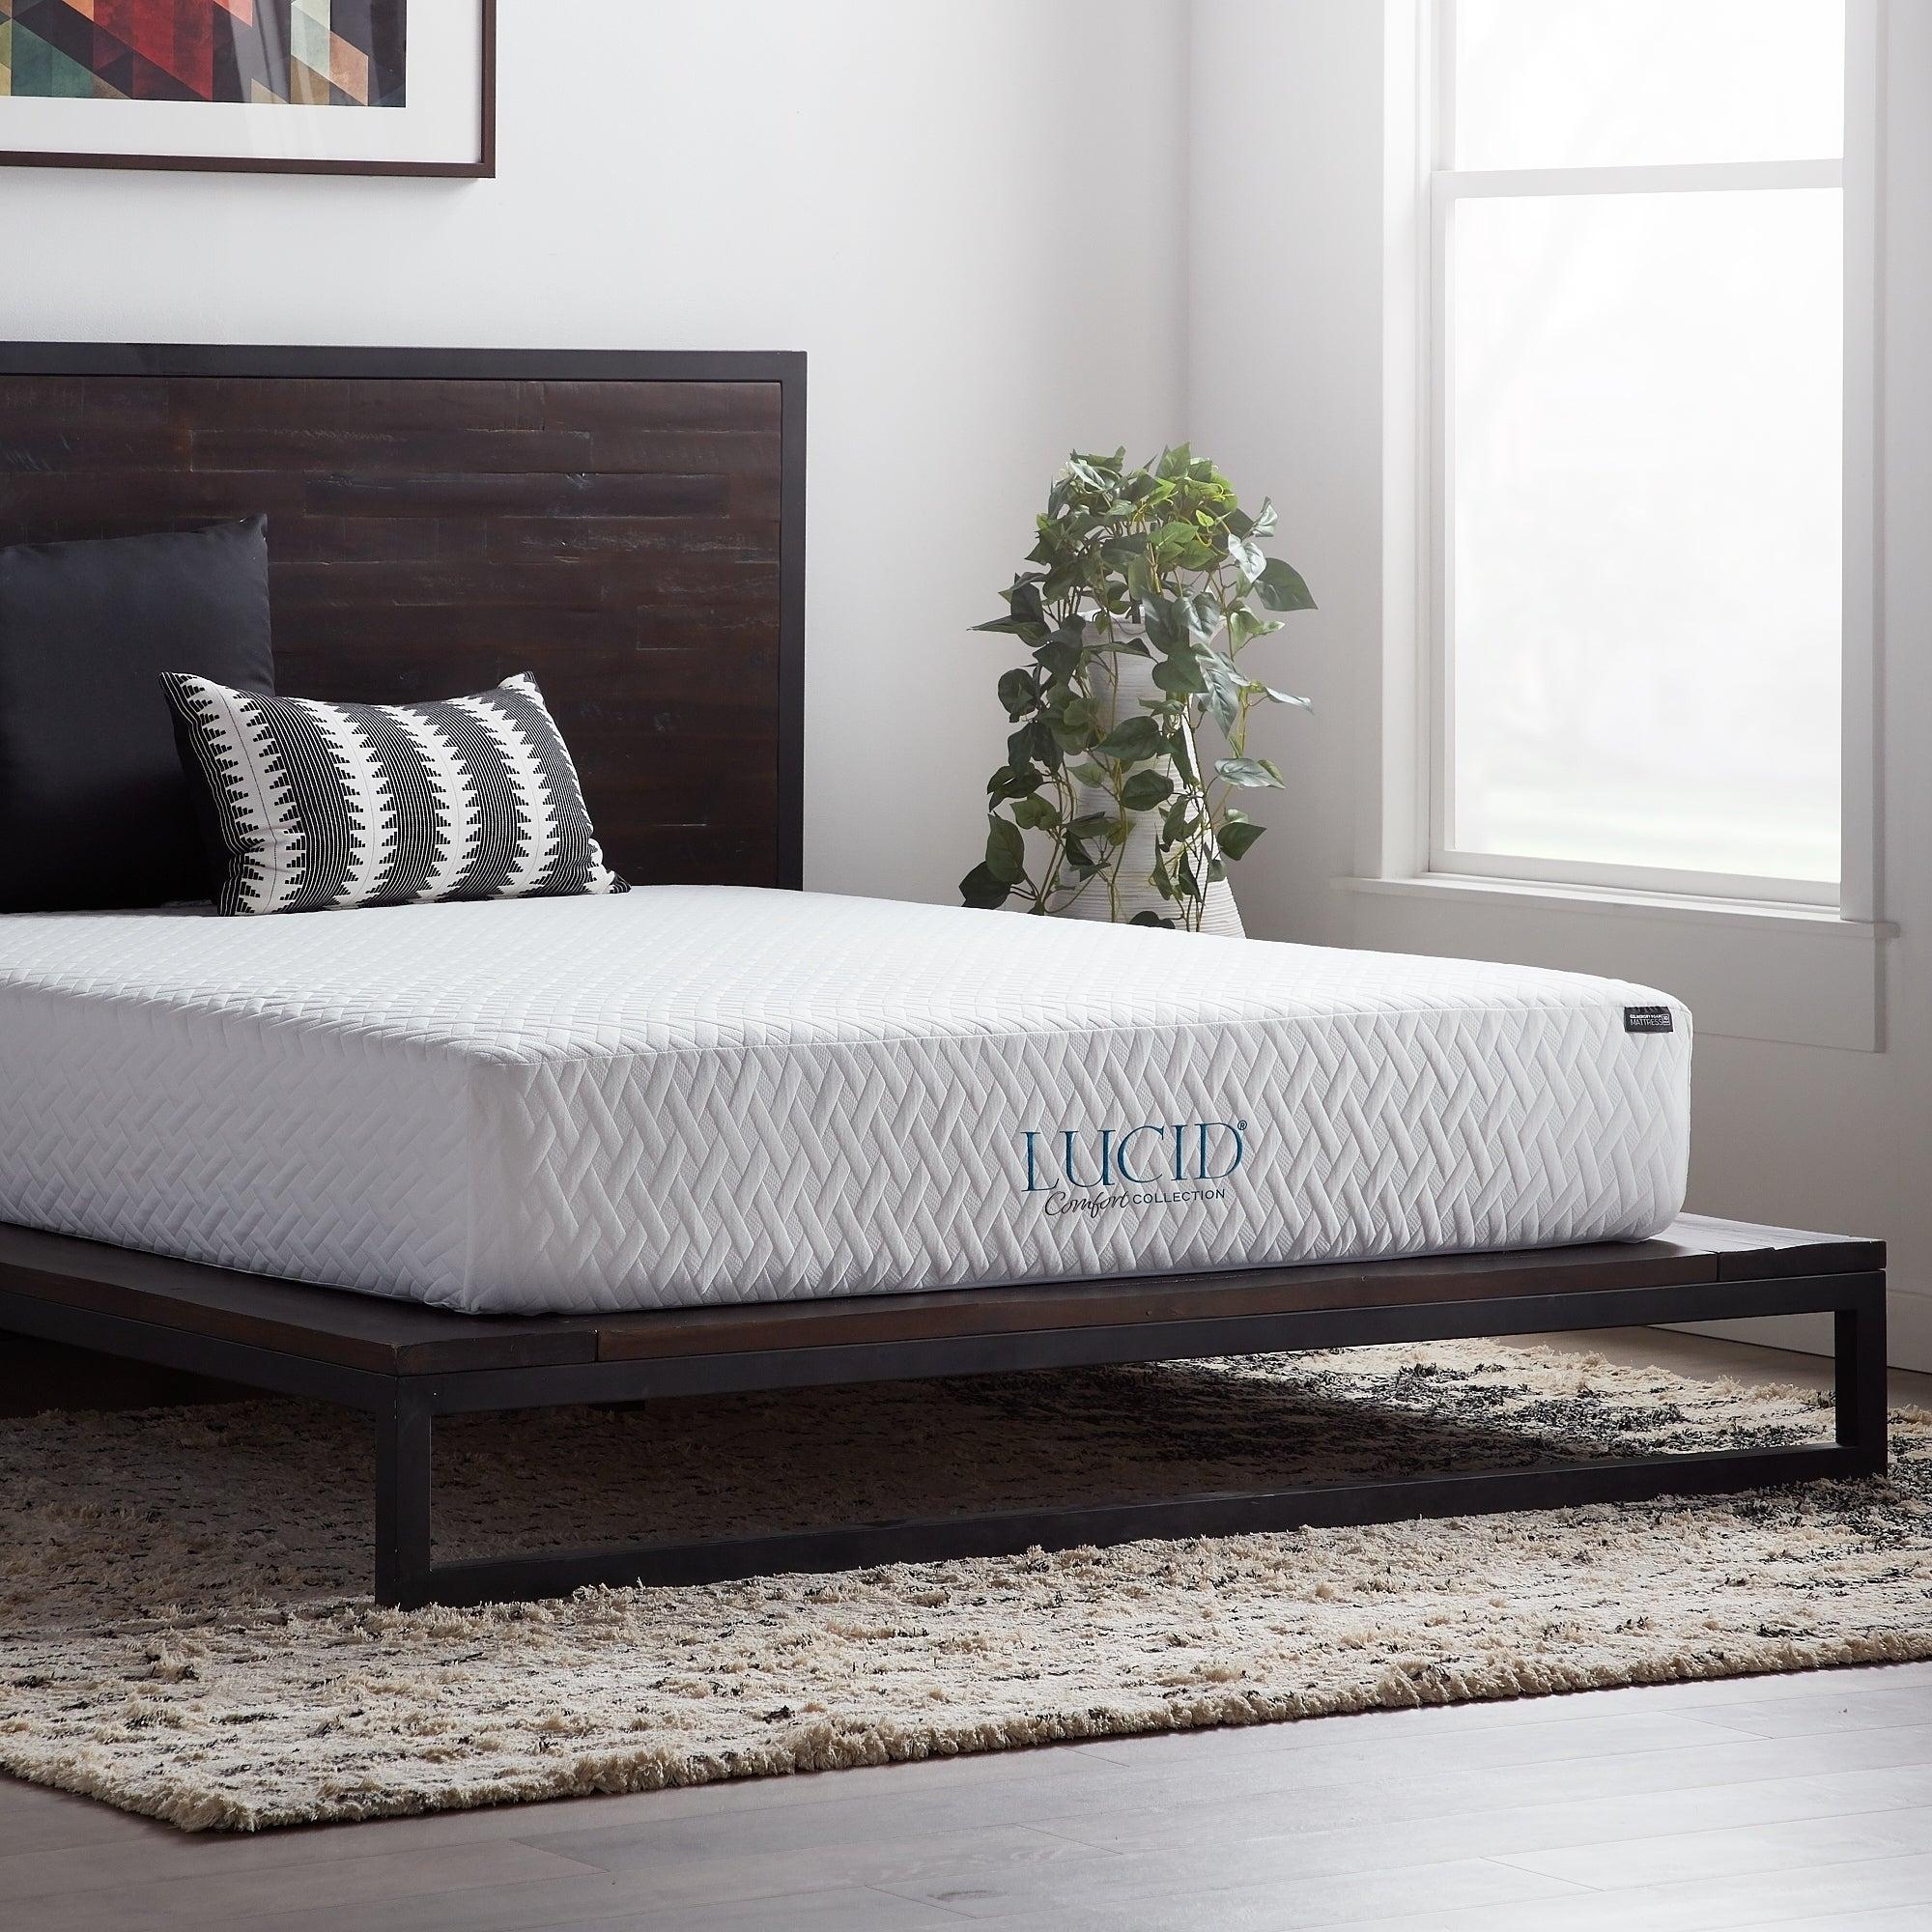 Bedroom Furniture | Find Great Furniture Deals Shopping at ...